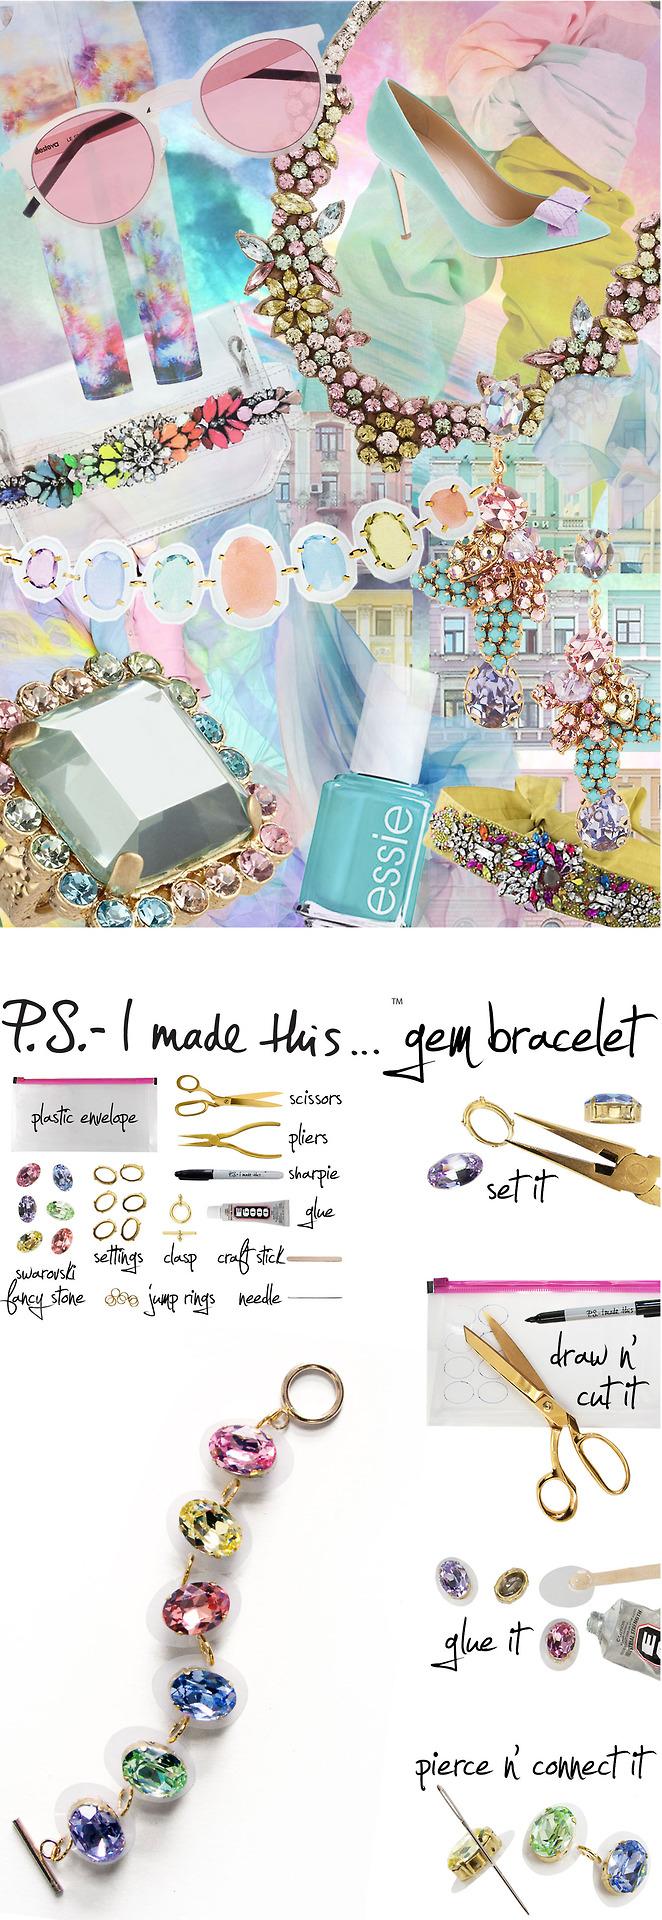 gem_bracelet-tumblr_MERGED